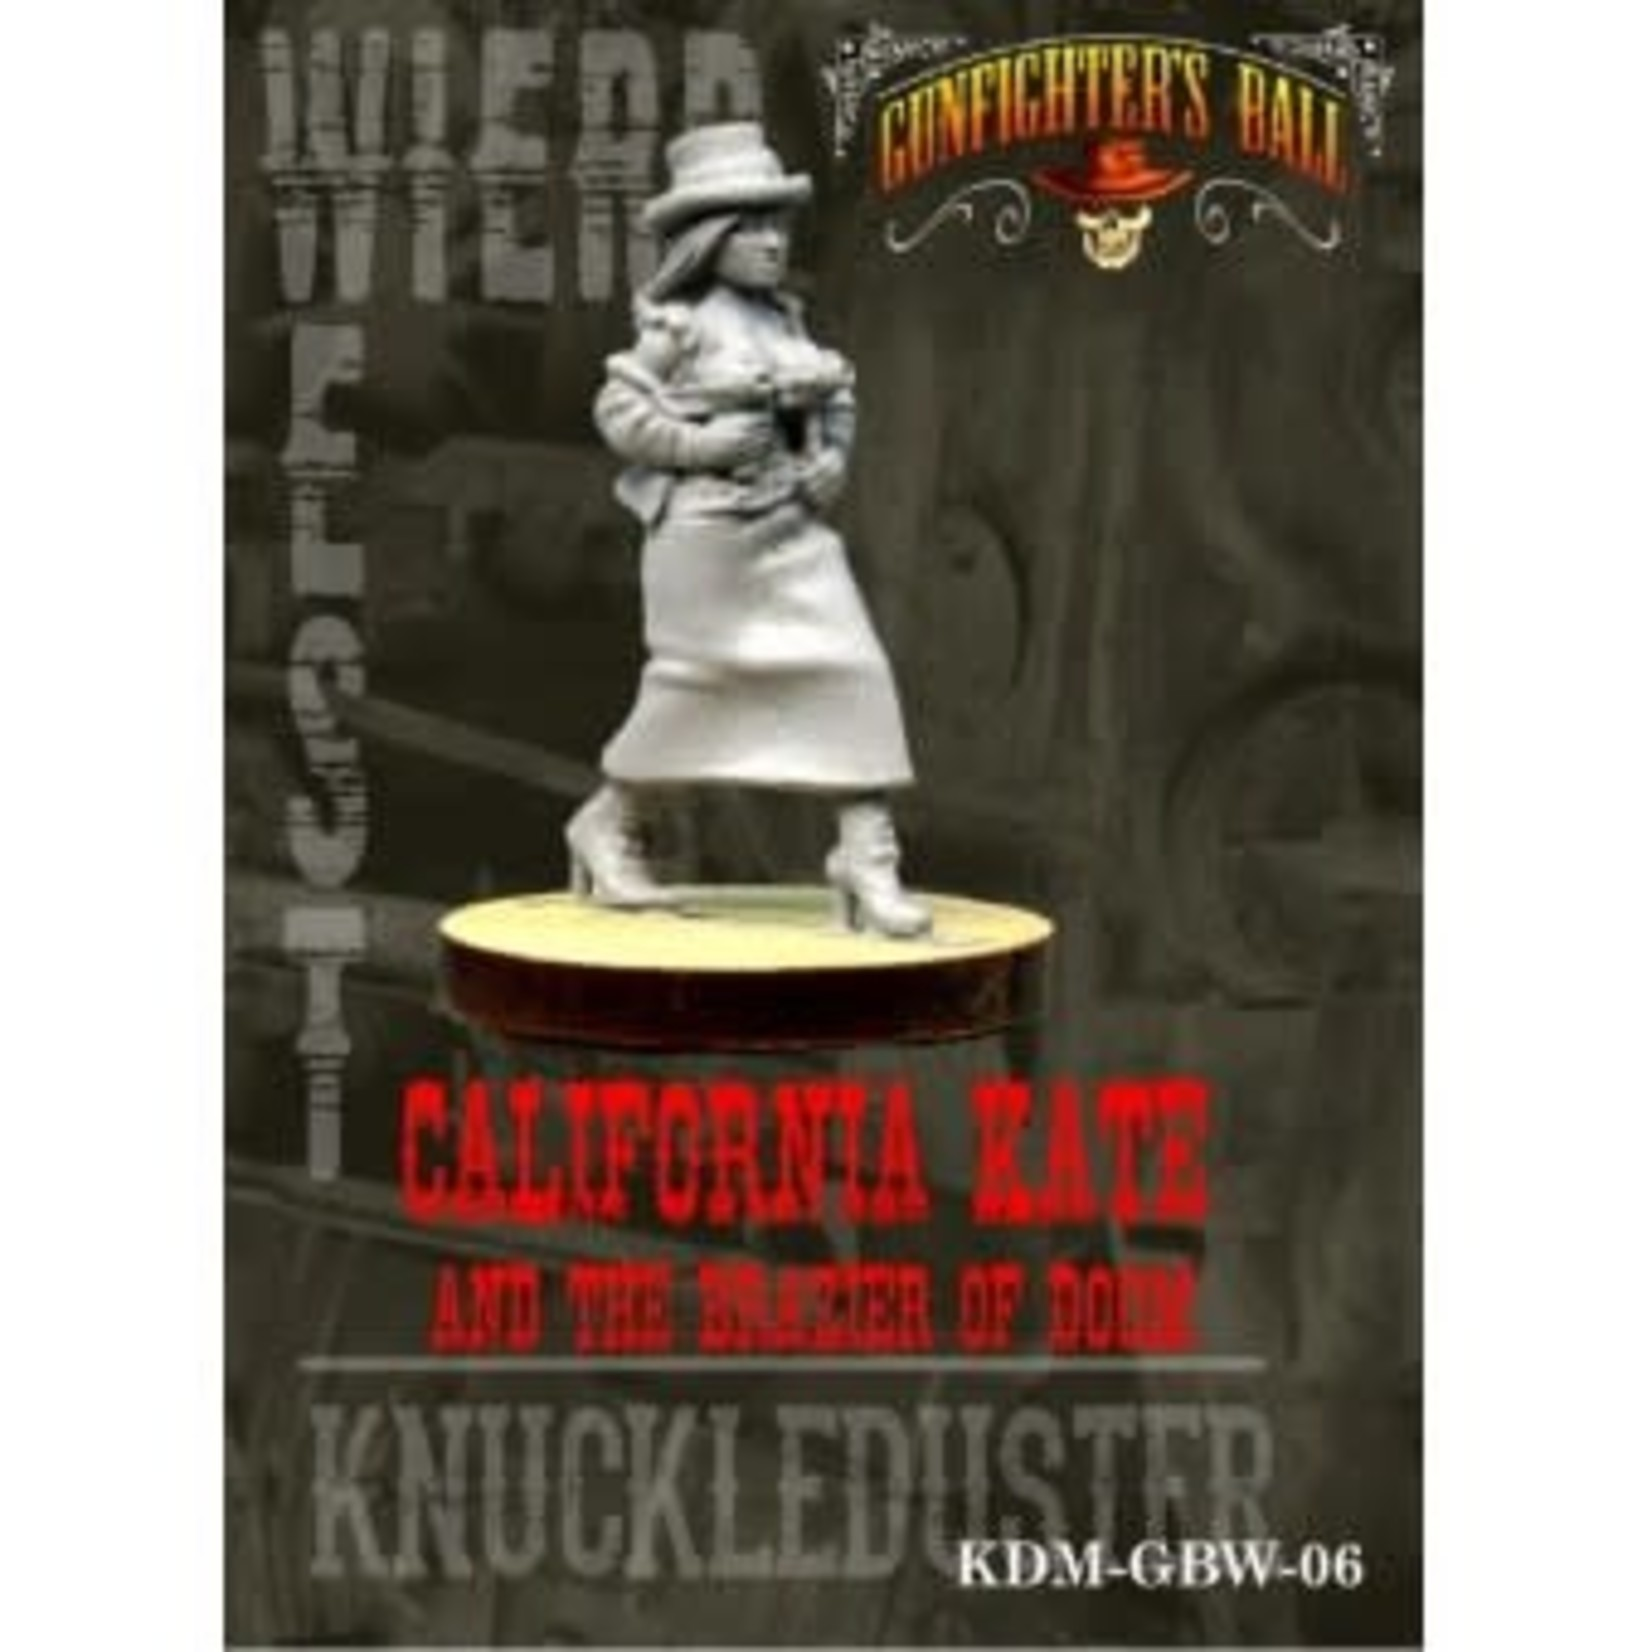 California Kate & The Brazier of Doom!